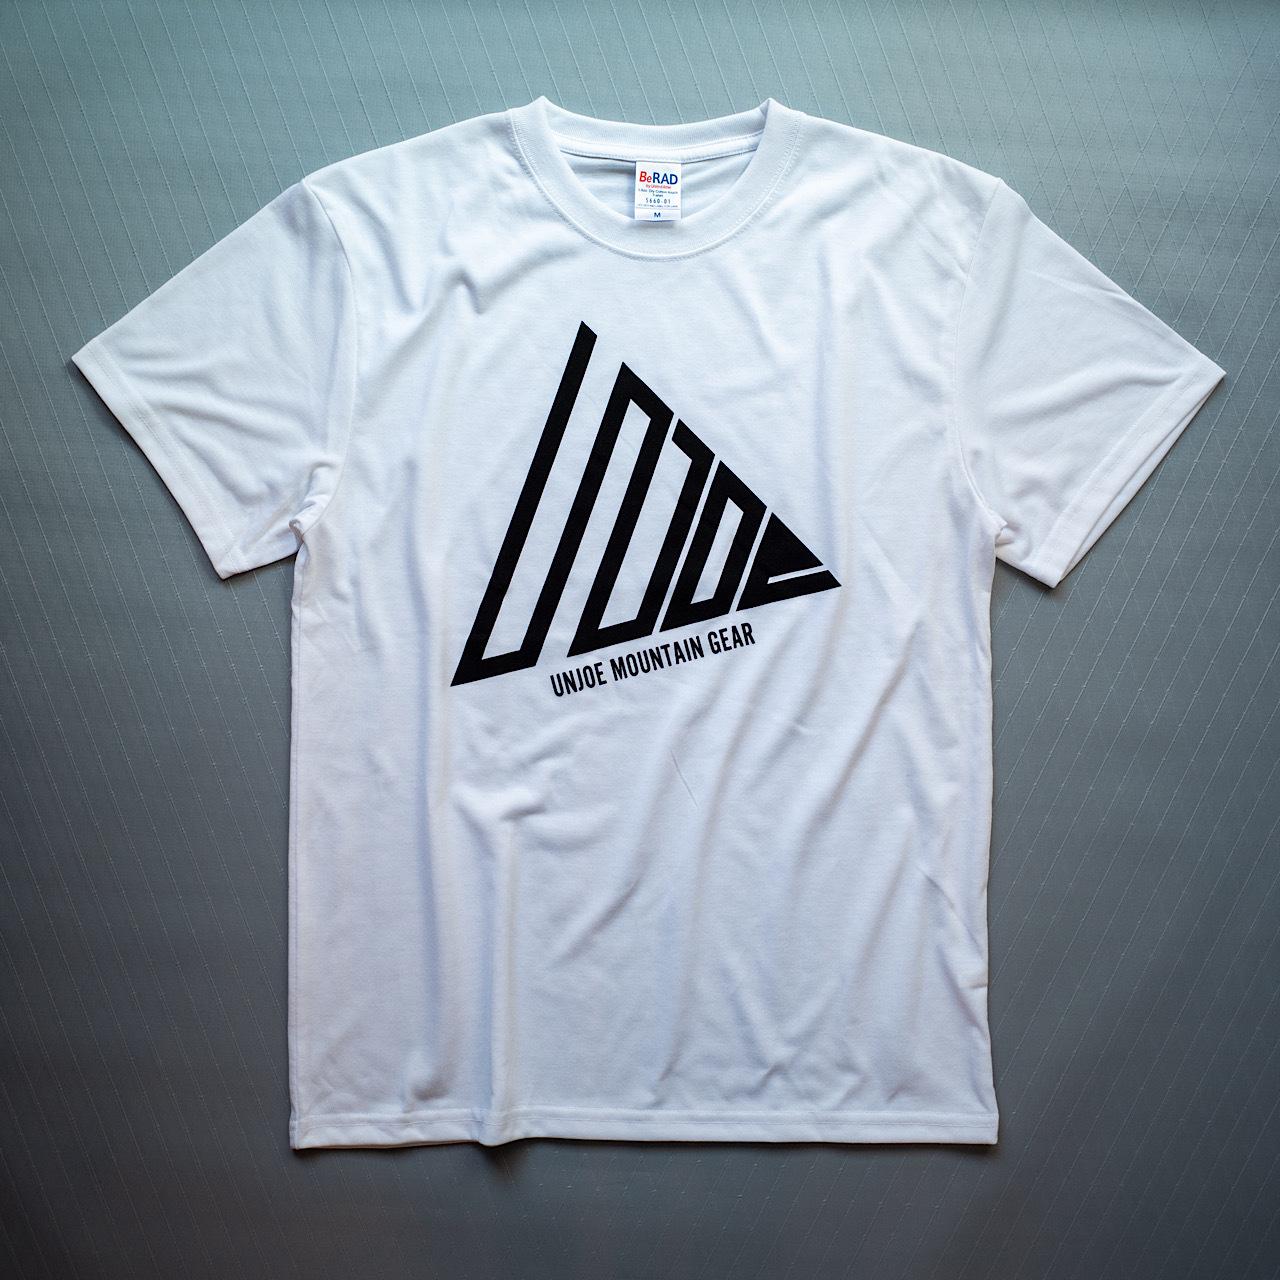 UNJOE T-shirt (white)